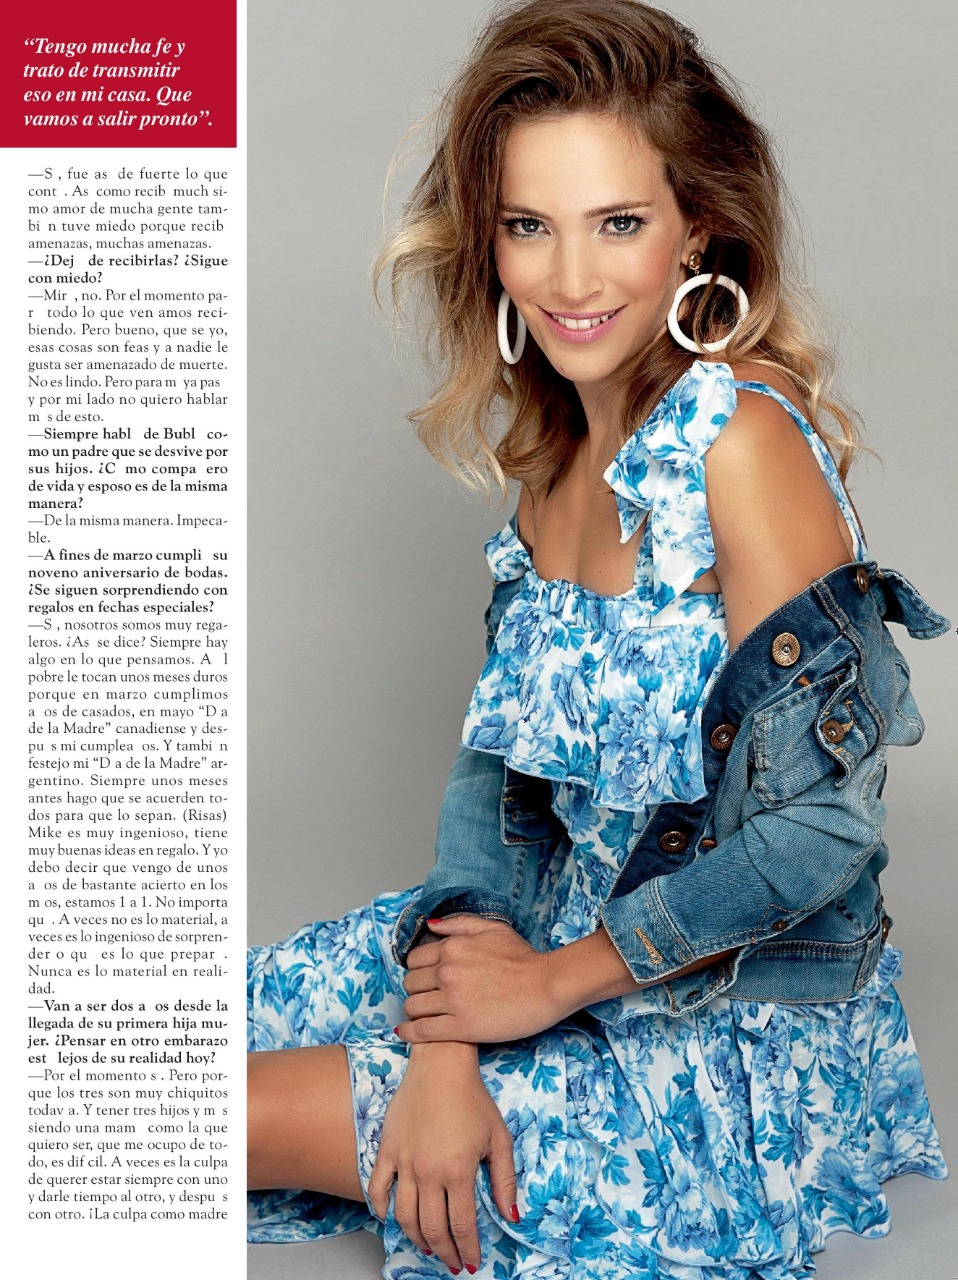 luisanalopilato famous actress caras magazine floral dress